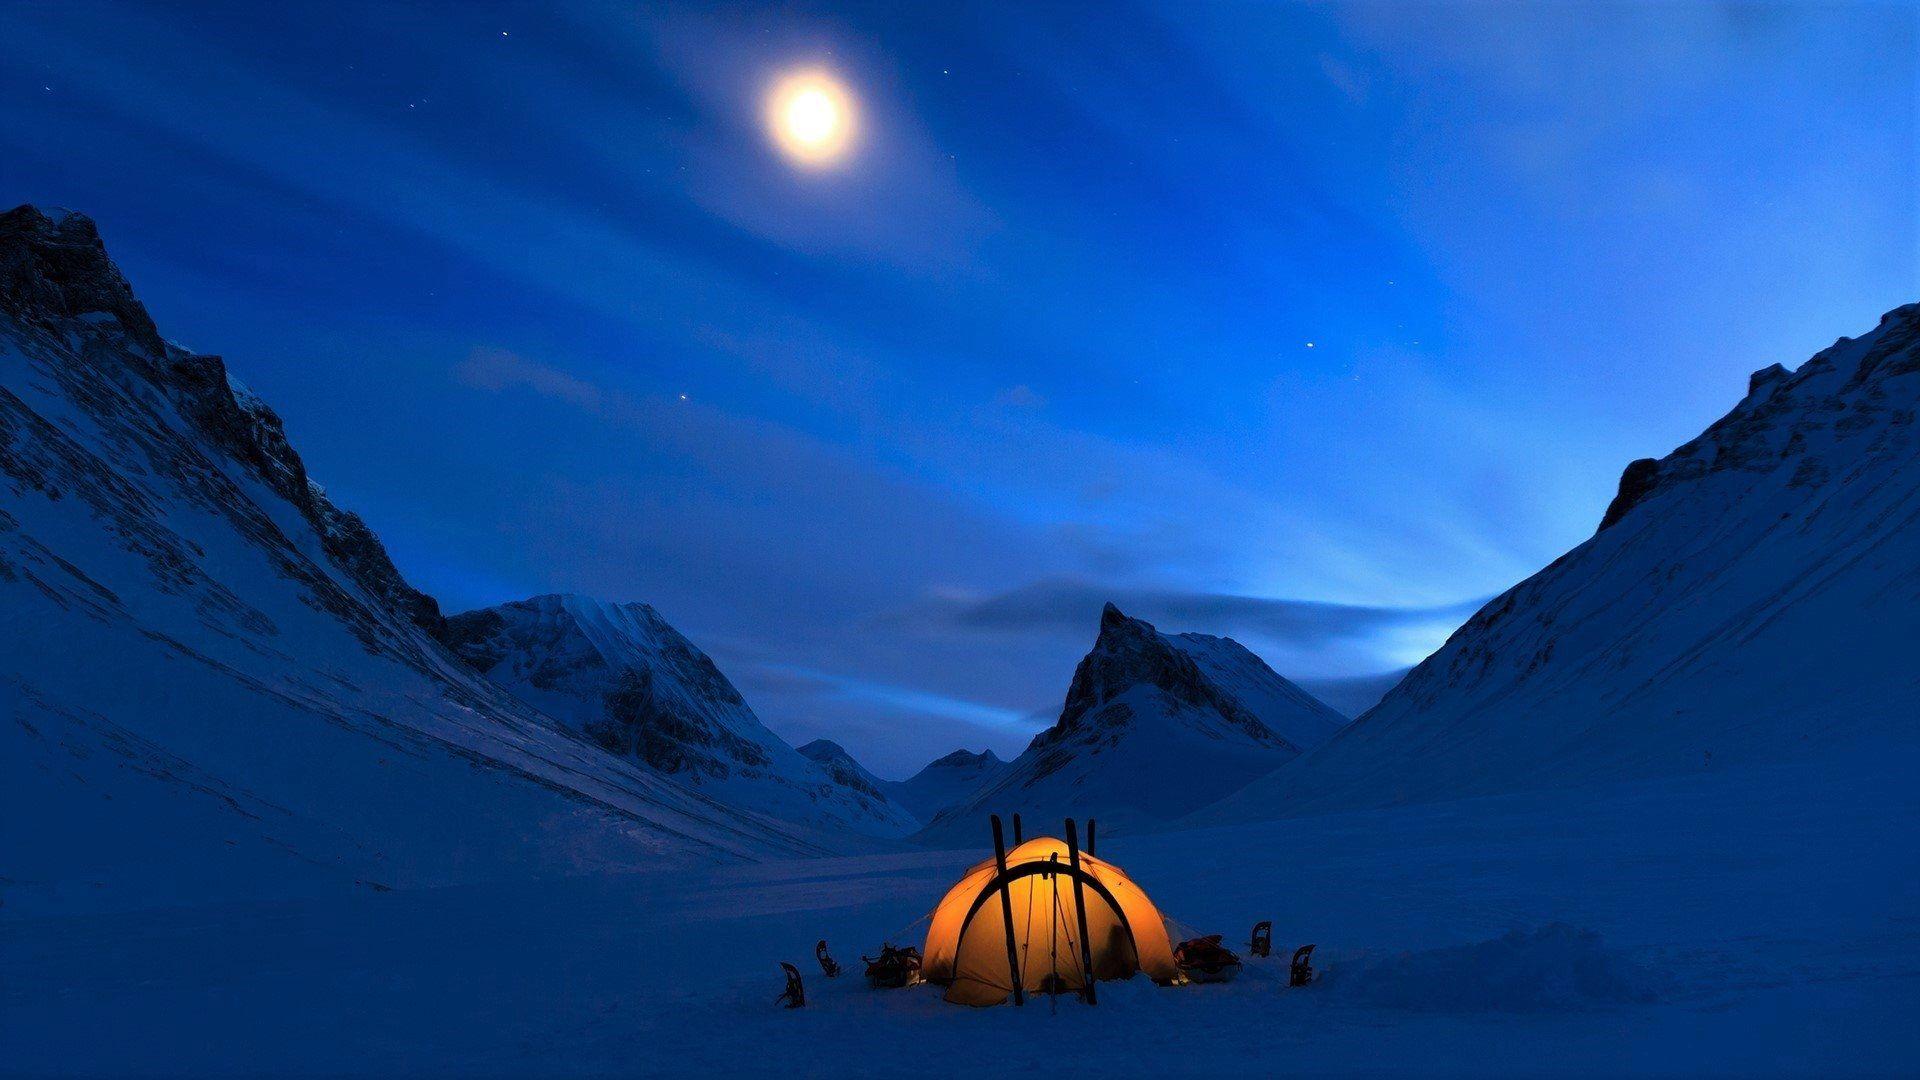 Free Desktop Backgrounds Camping